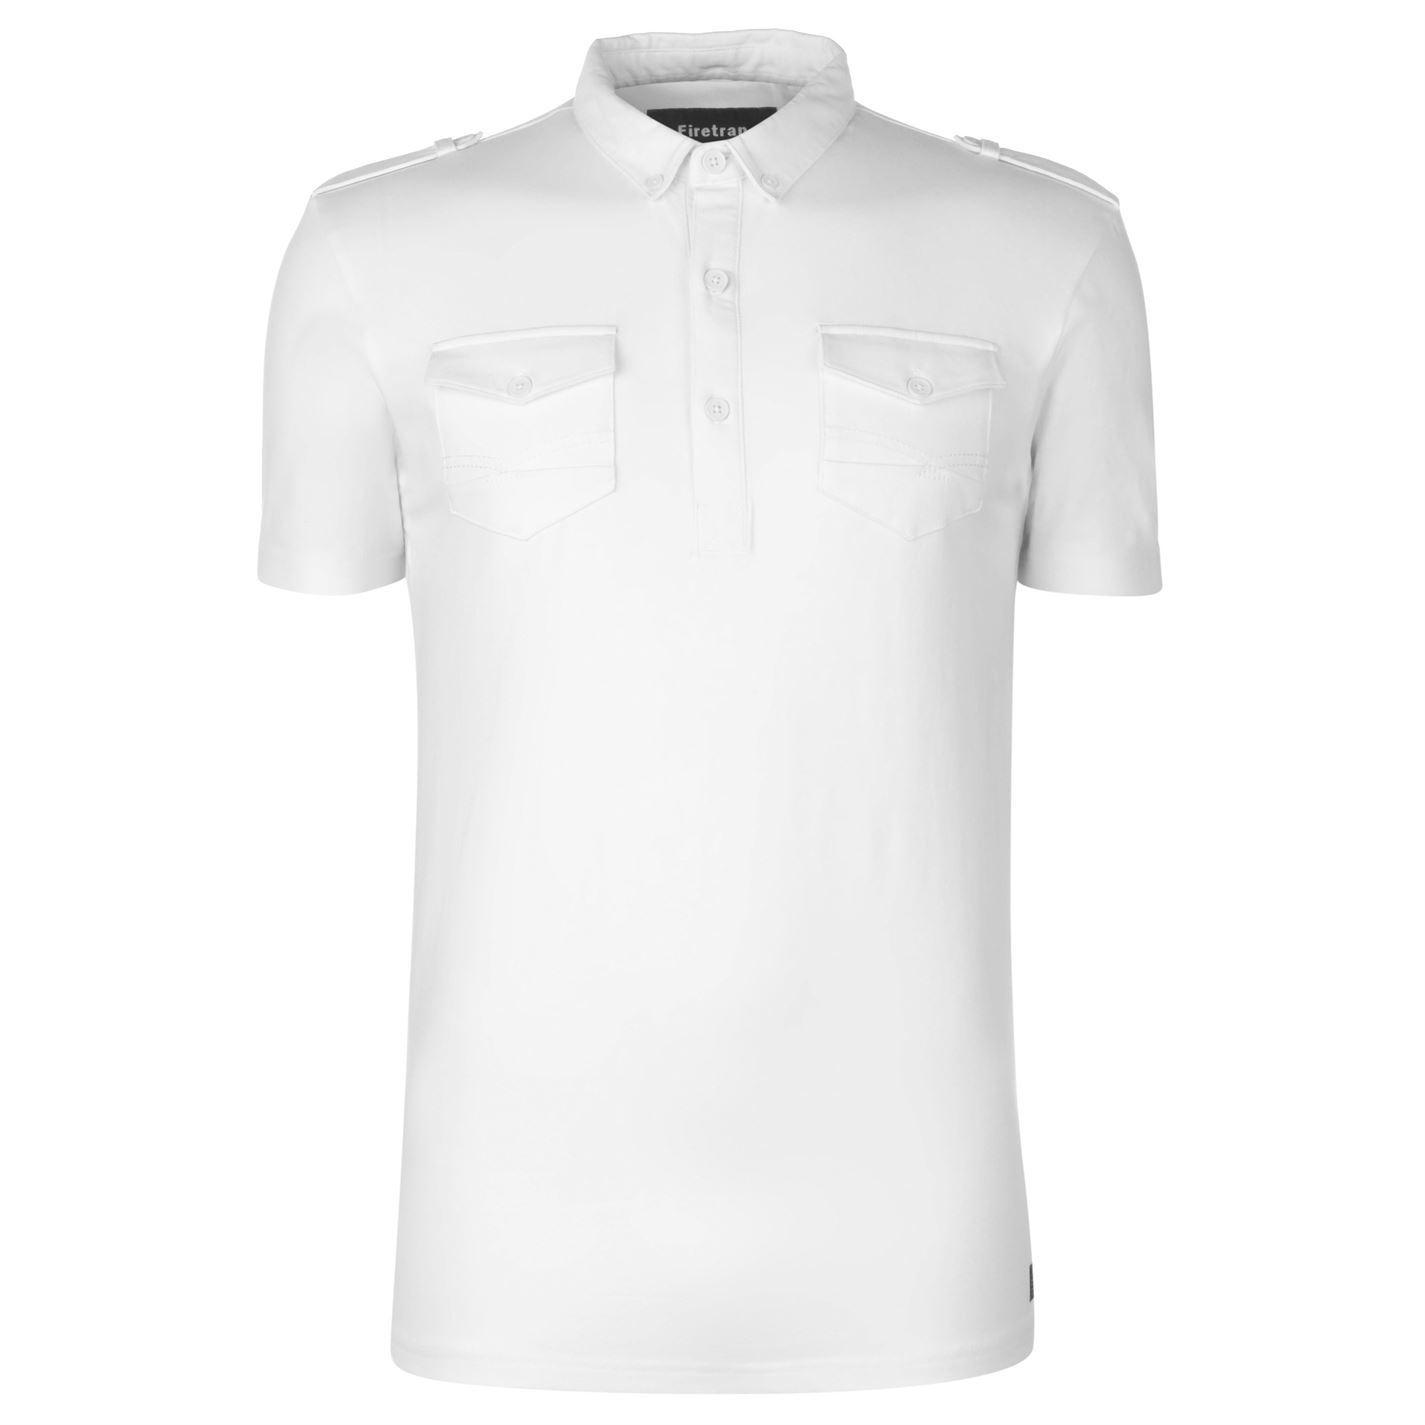 thumbnail 12 - Firetrap-Double-Pocket-Polo-Shirt-Mens-Collar-Top-Tee-Black-Medium